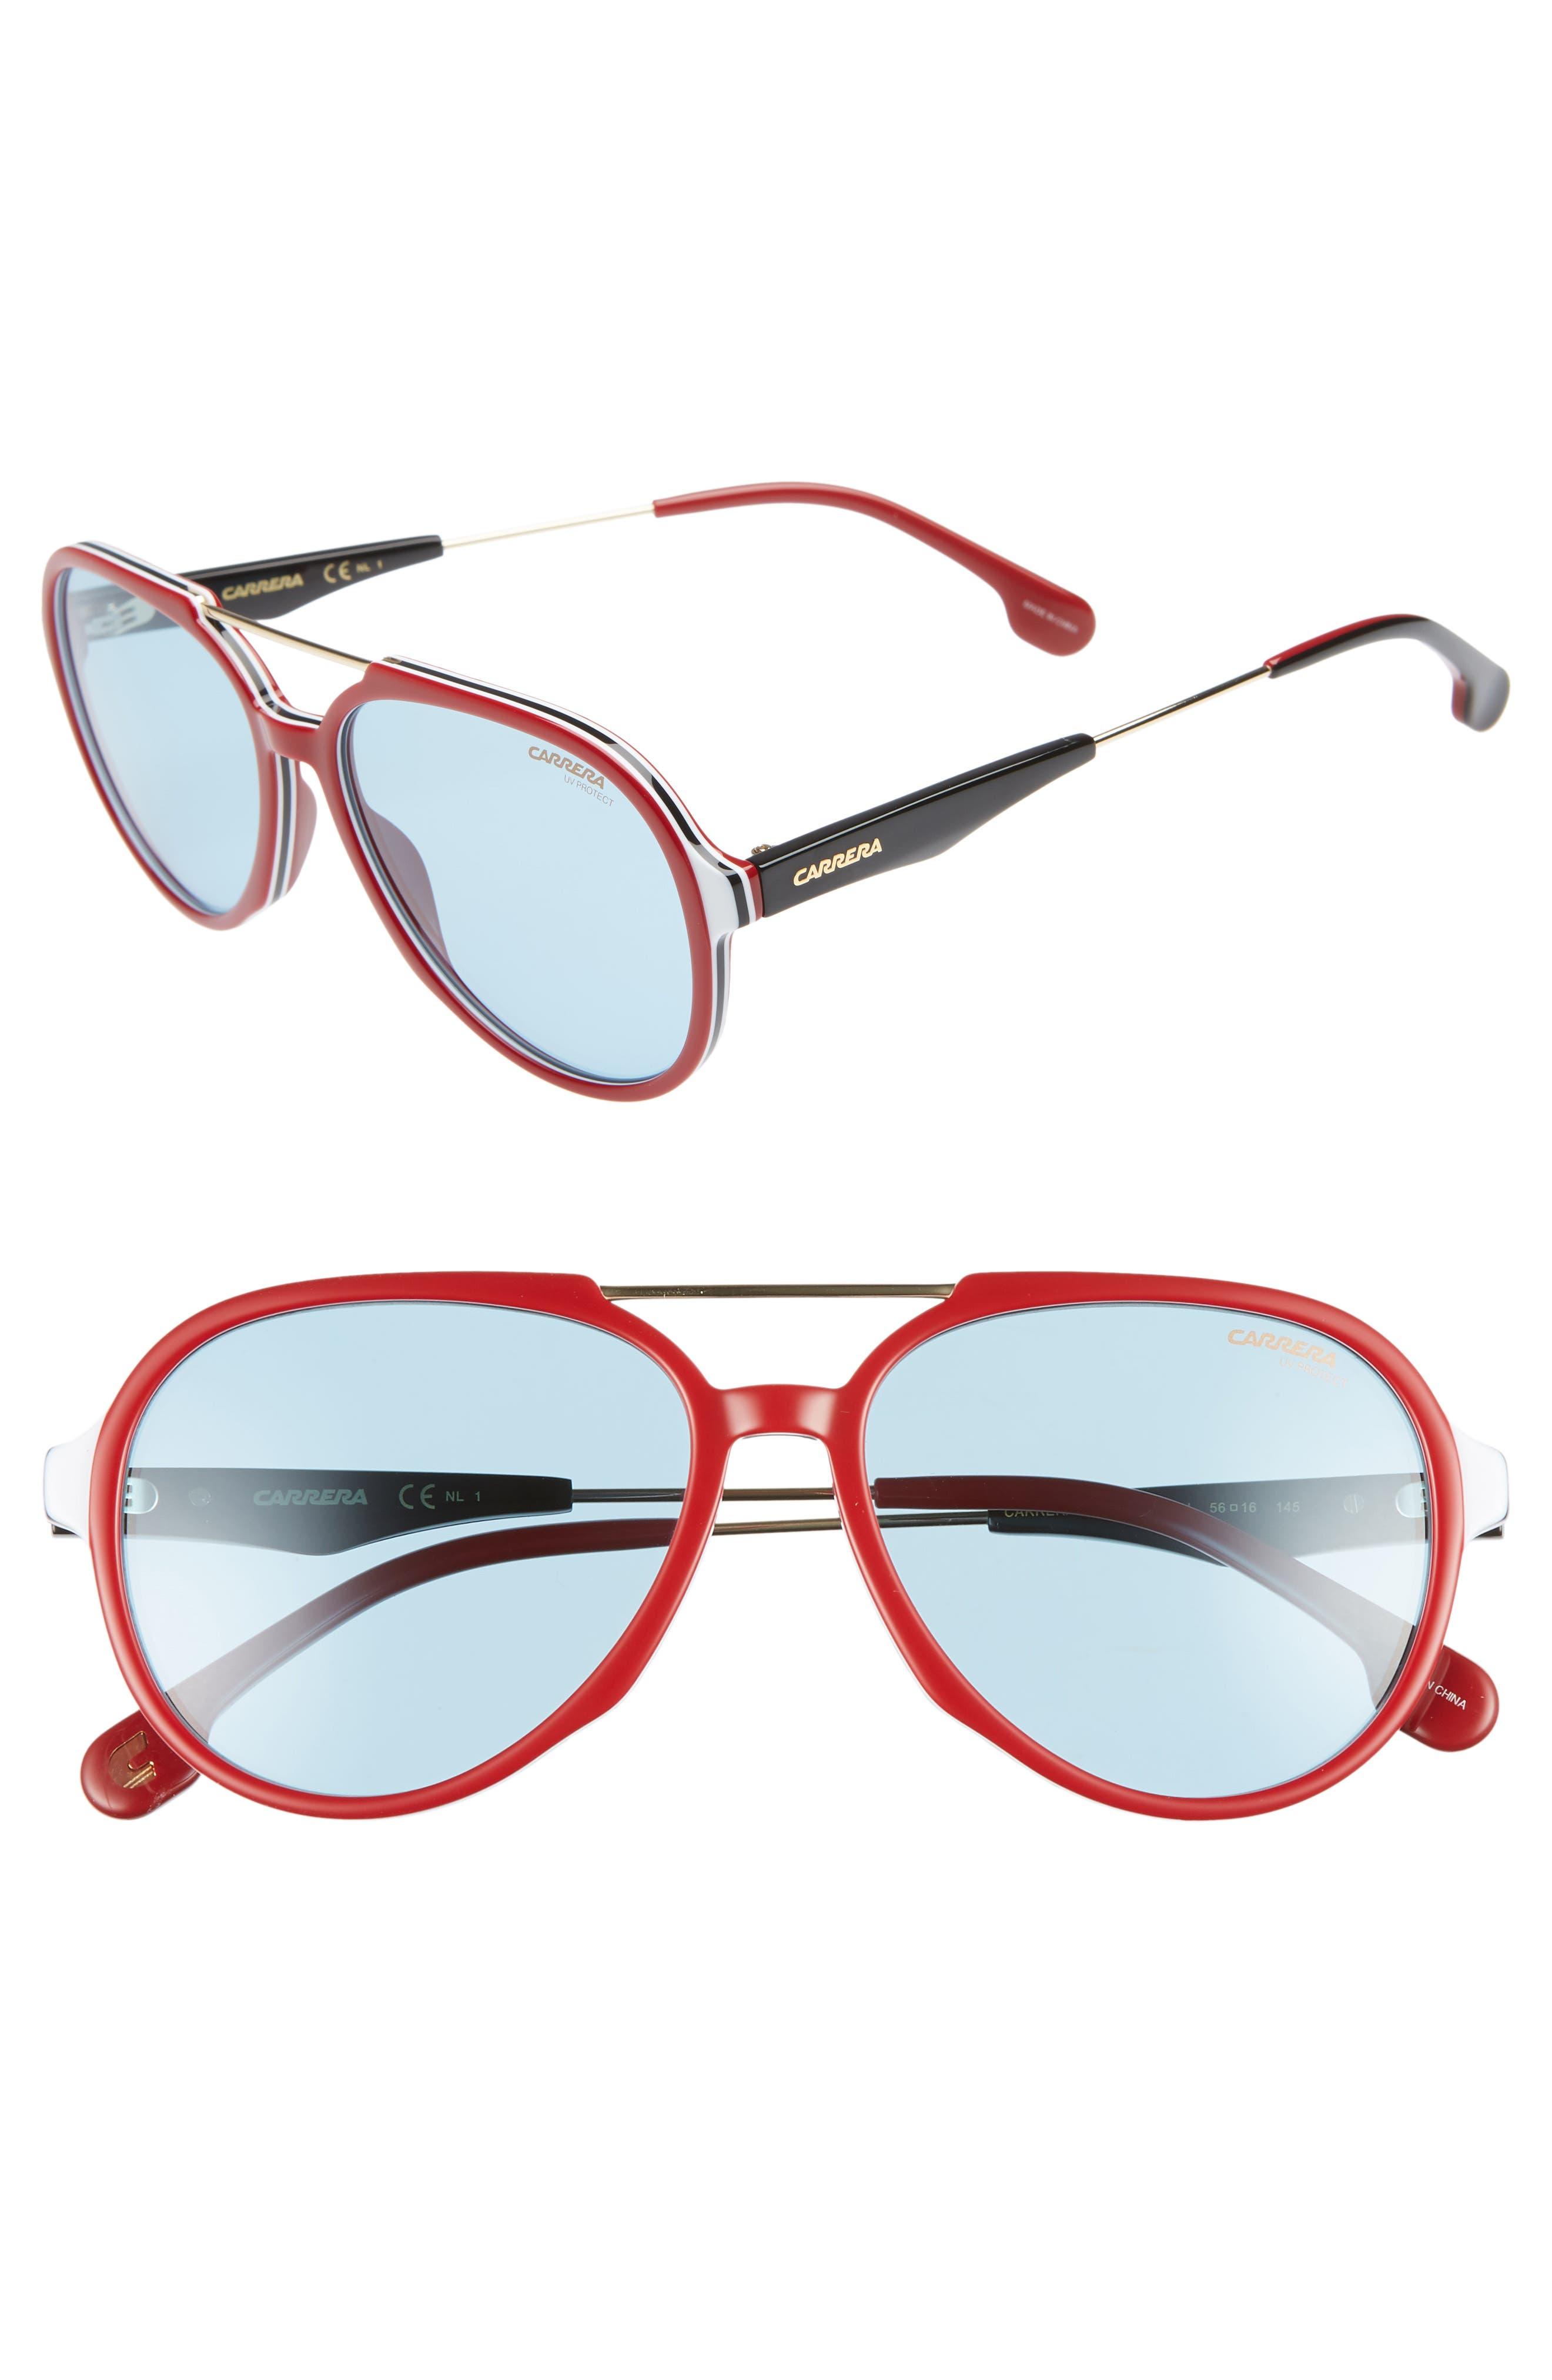 Carrera Eyewear 5m Aviator Sunglasses - Burgandy/gold